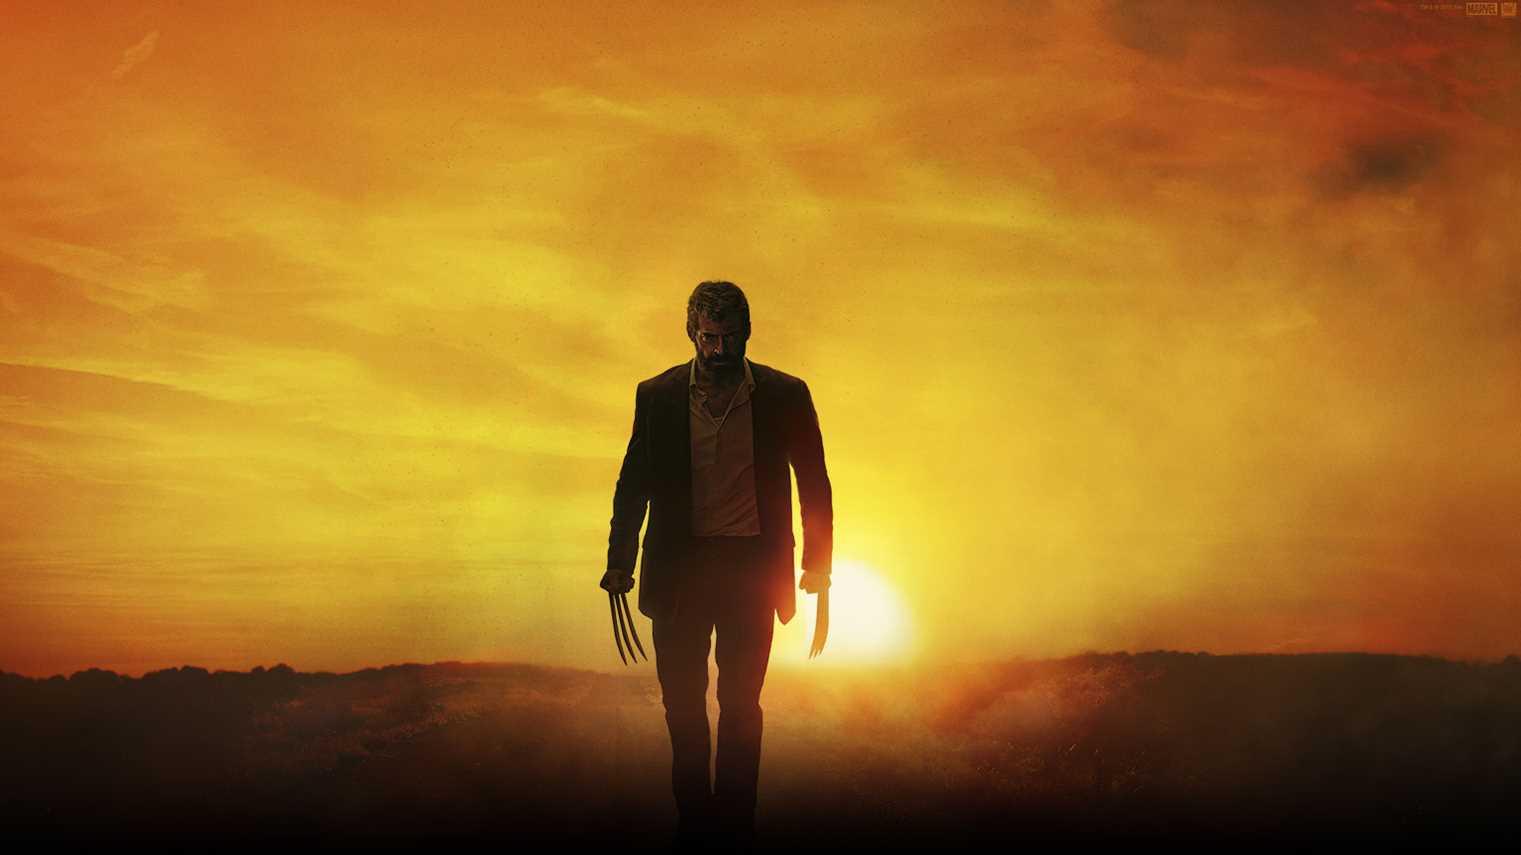 Logan Film Tickets   Book in 3D   Vue Cinemas